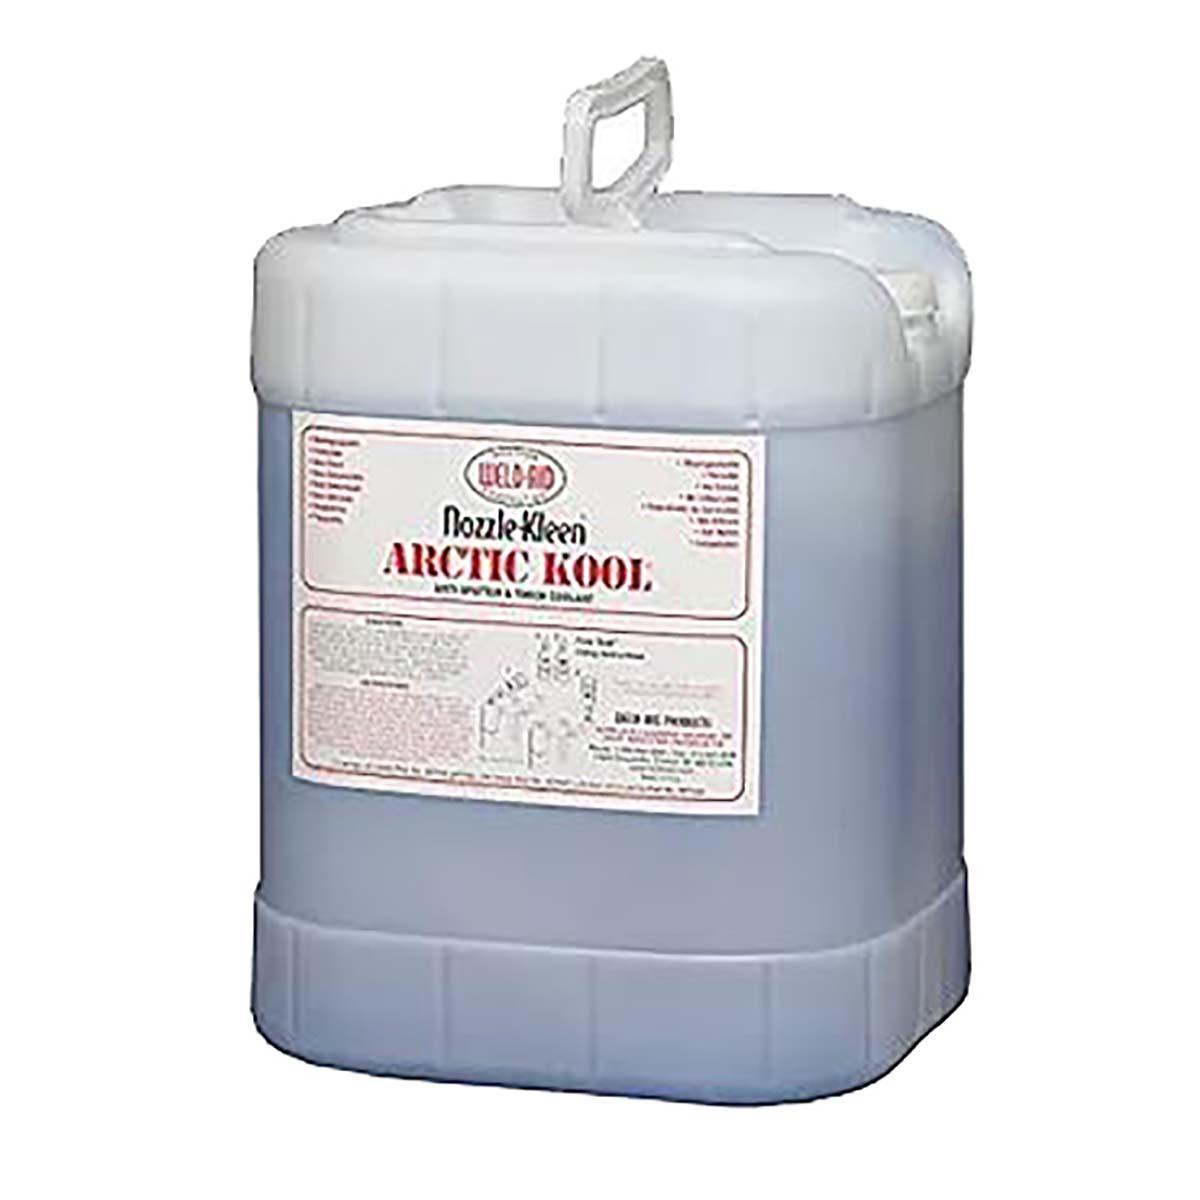 Arctic Kool Torch Coolant  1 gal/3.8 L